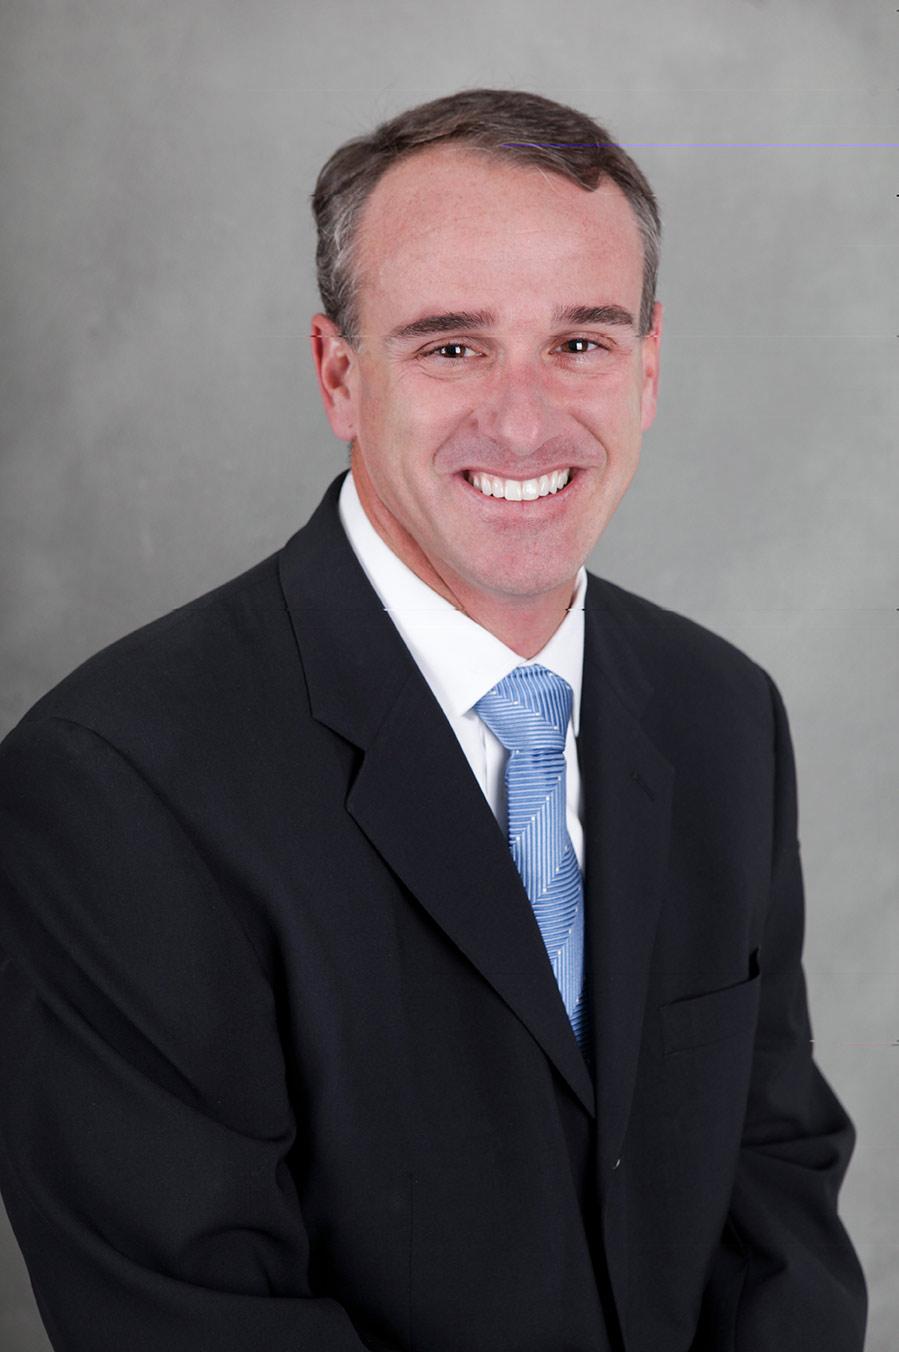 Patrick F. Billiter